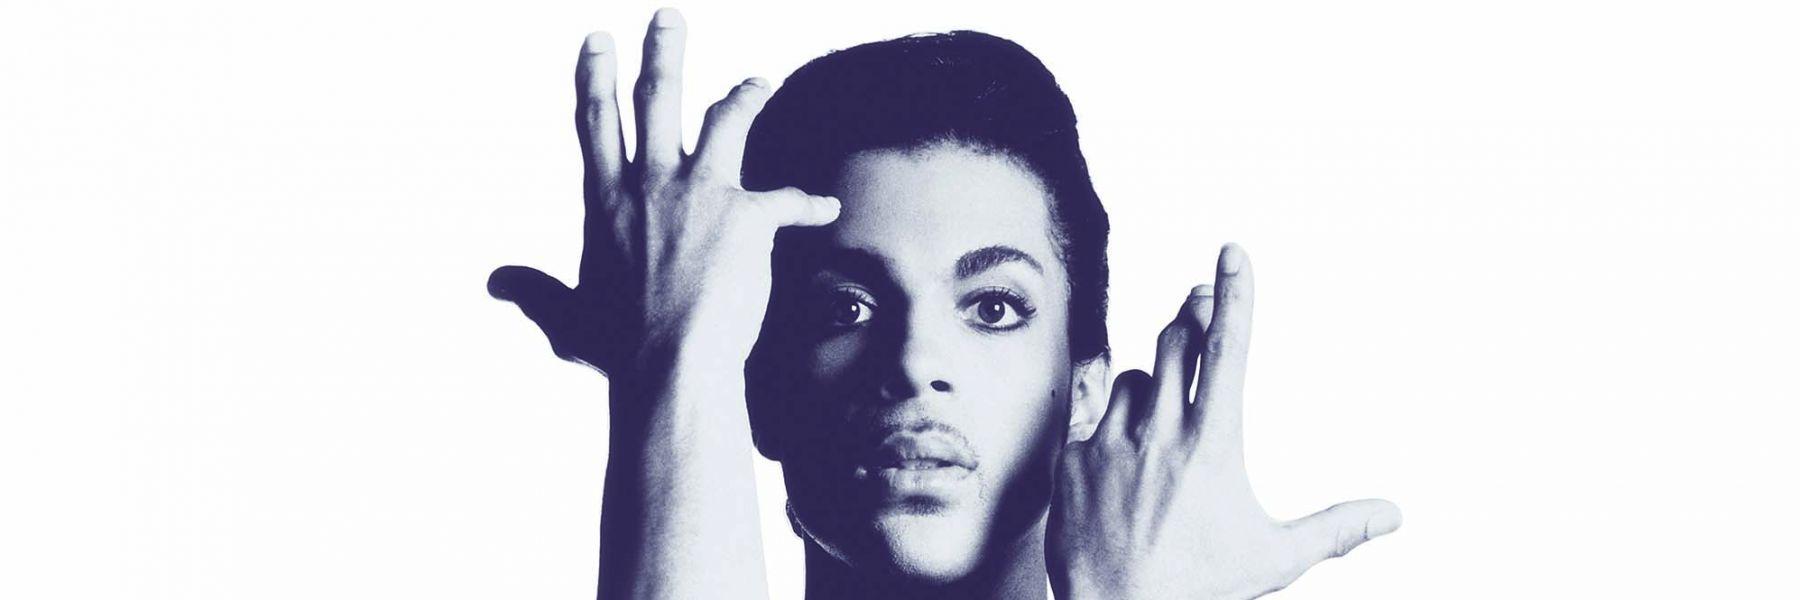 4U: A Symphonic Celebration of Prince am 28. November 2018 in der Samsung Hall